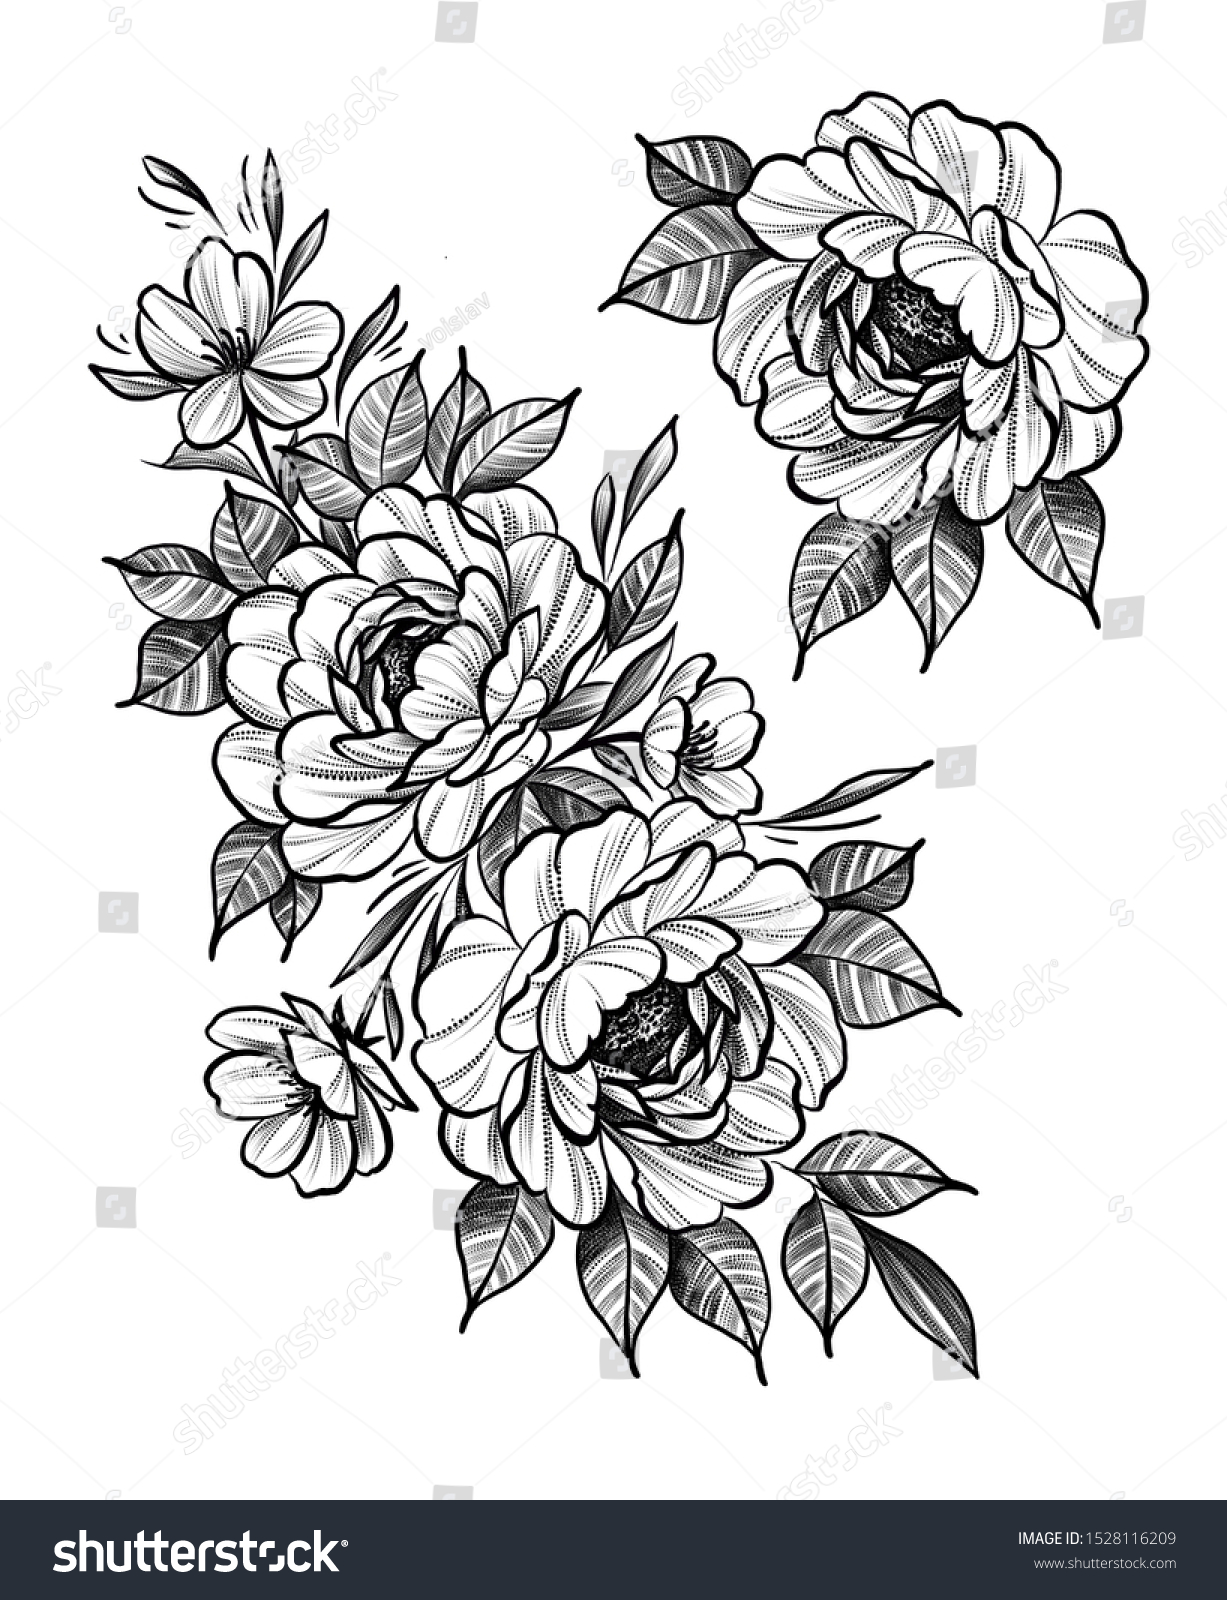 Beautiful Flowers Drawing Sketch Tattoo Design Stock Illustration 1528116209,Japanese Cherry Blossom Festival Dc